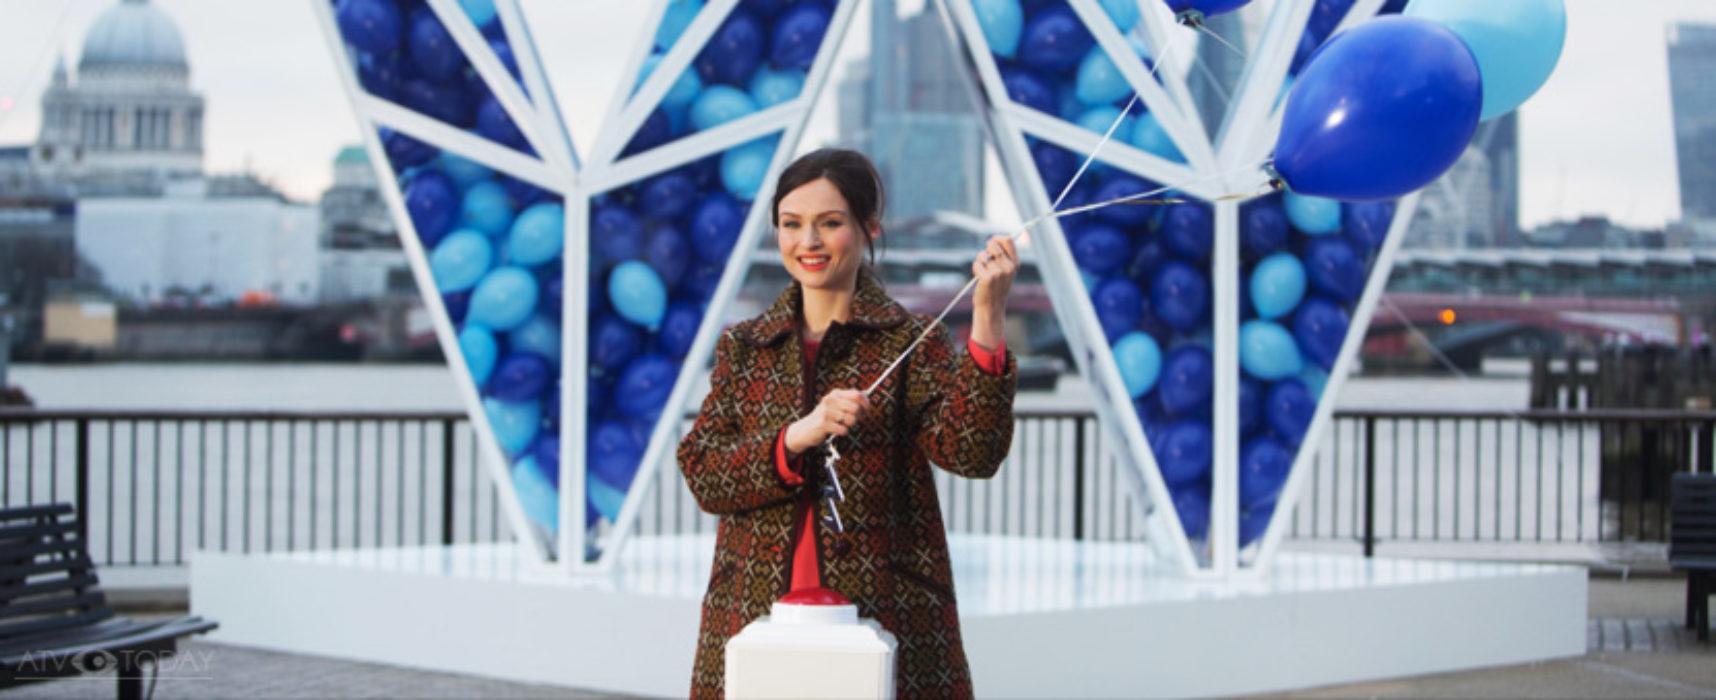 Sophie Ellis-Bextor helps launch UKTV's latest channel 'W'